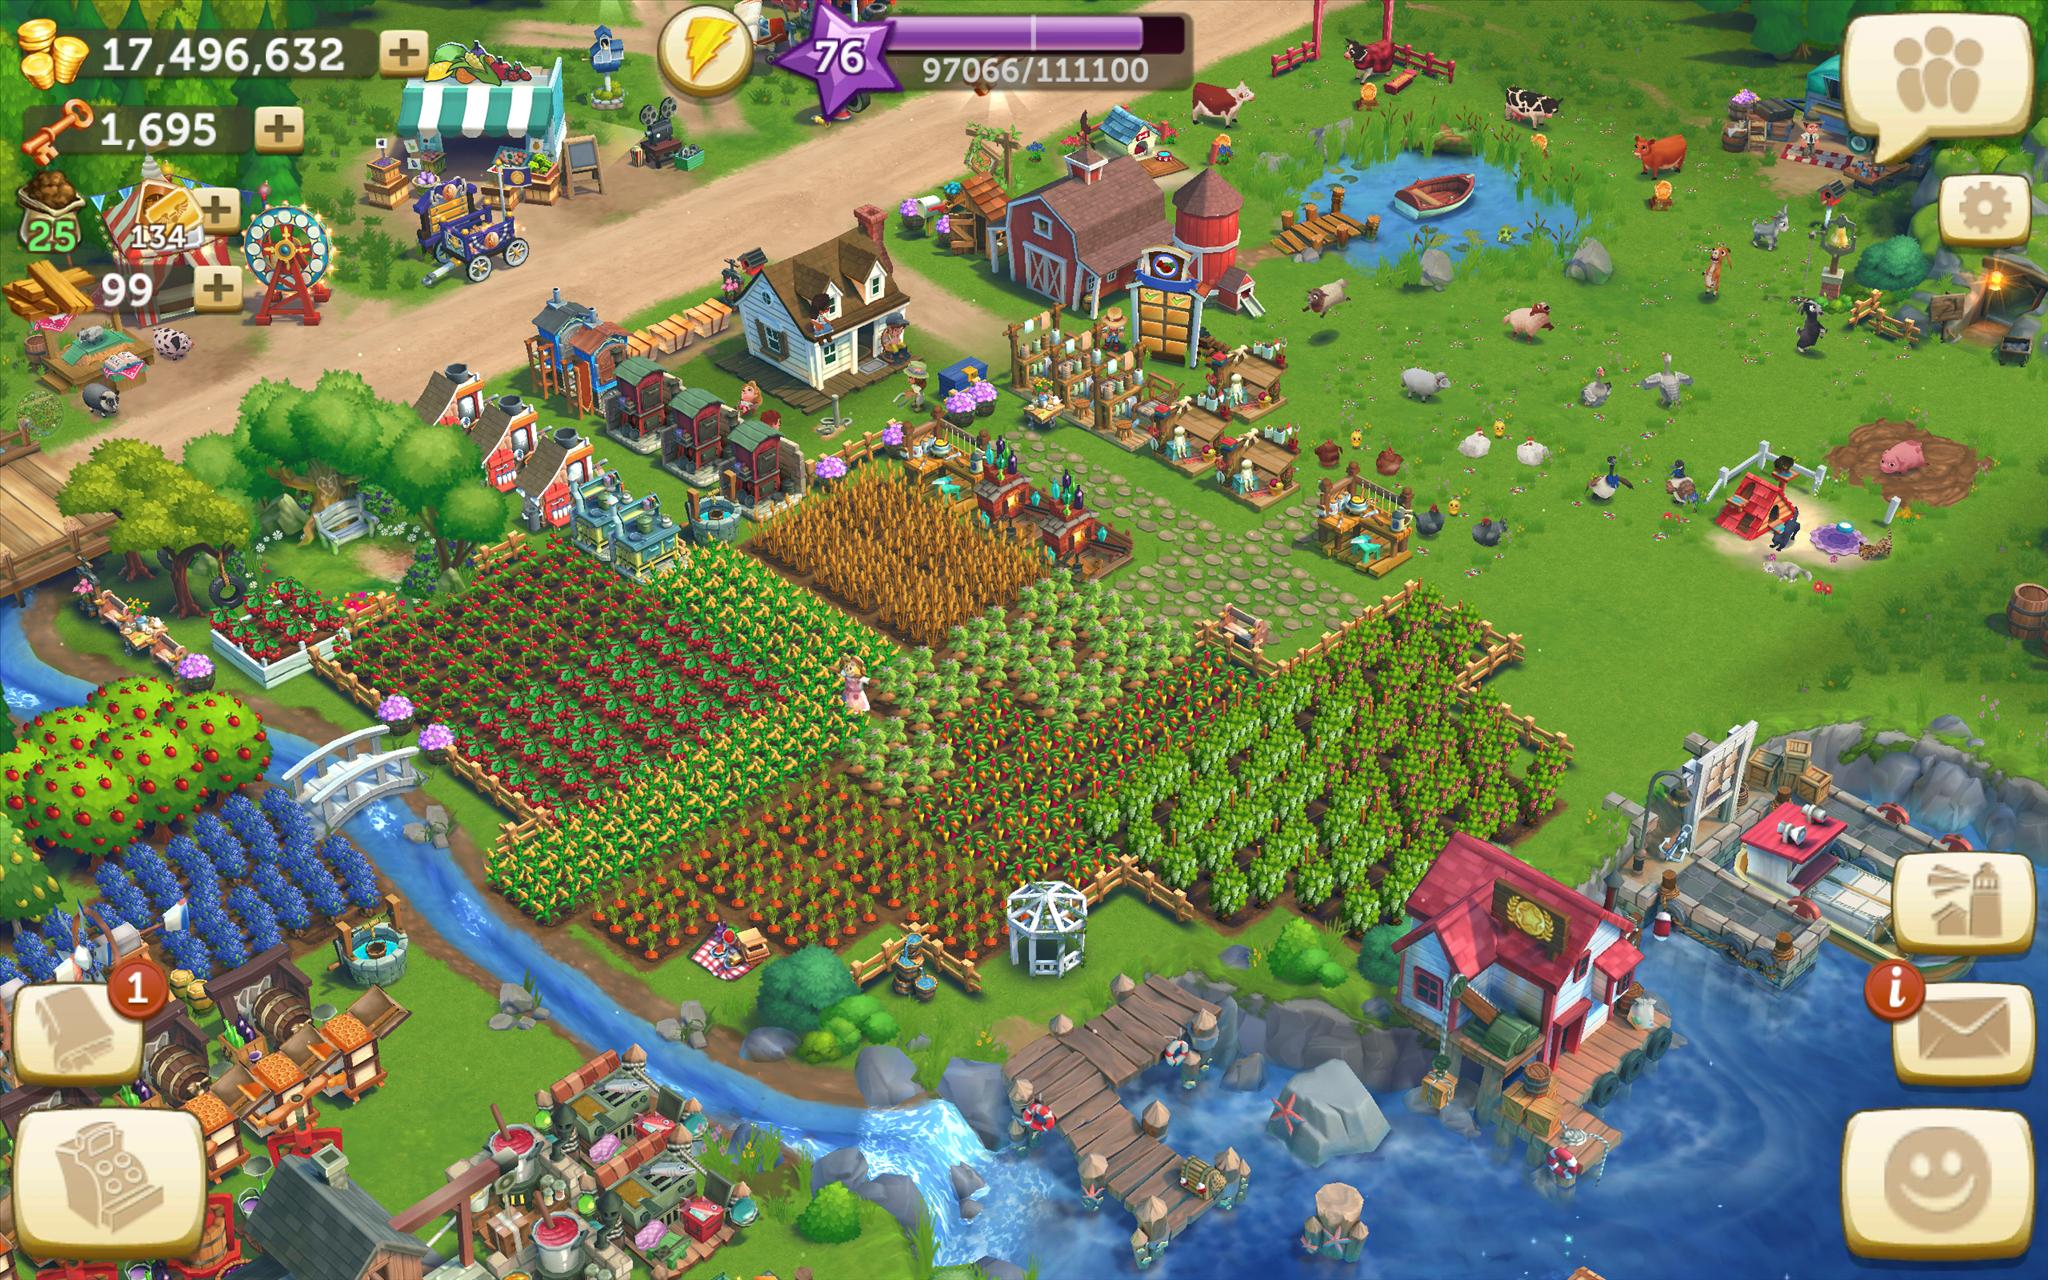 farmville 2 hack apk free download